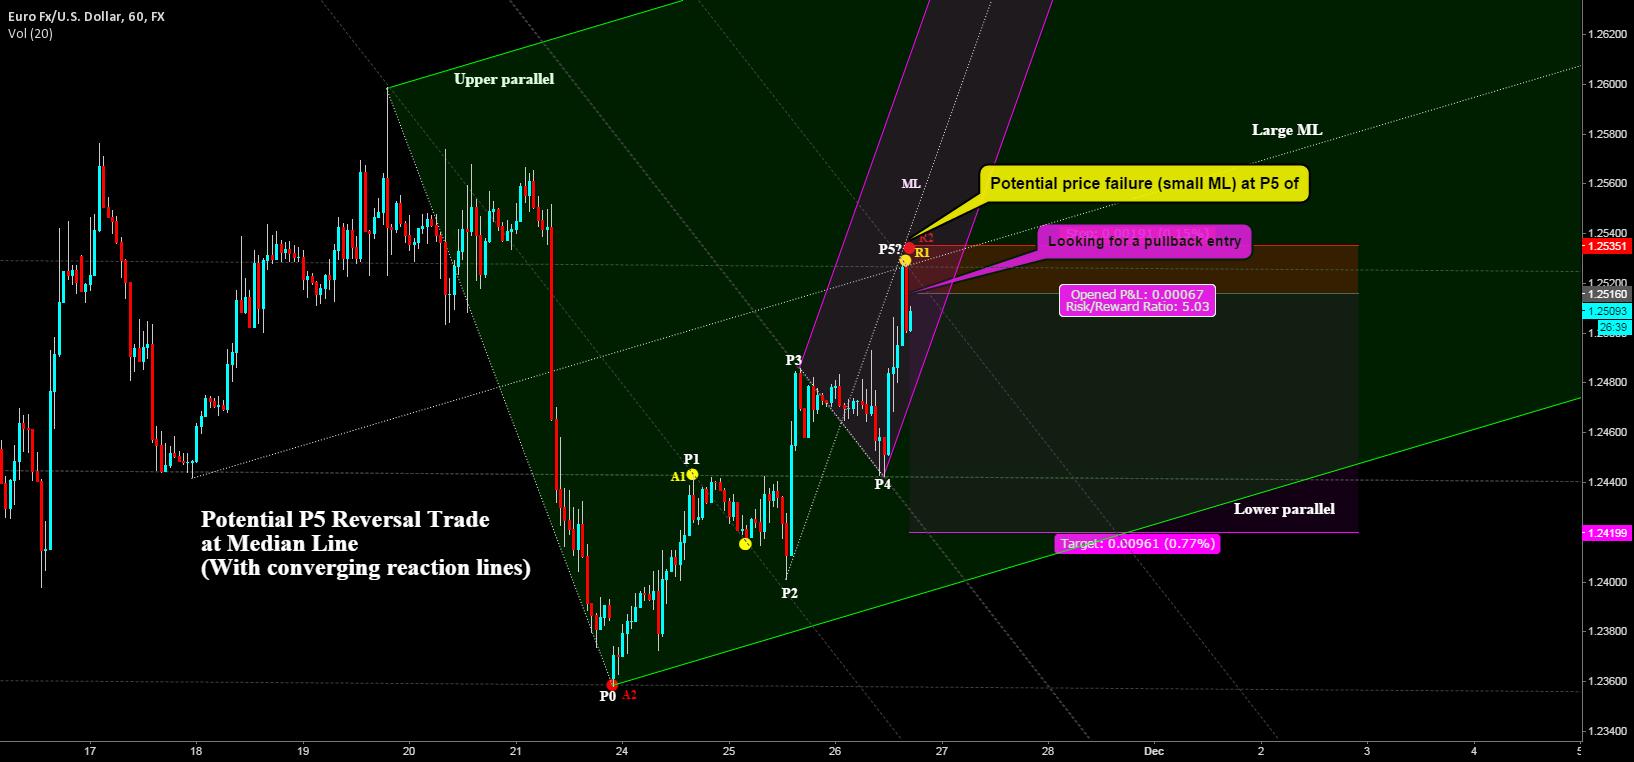 Potential P5 Reversal Trade at Median Line